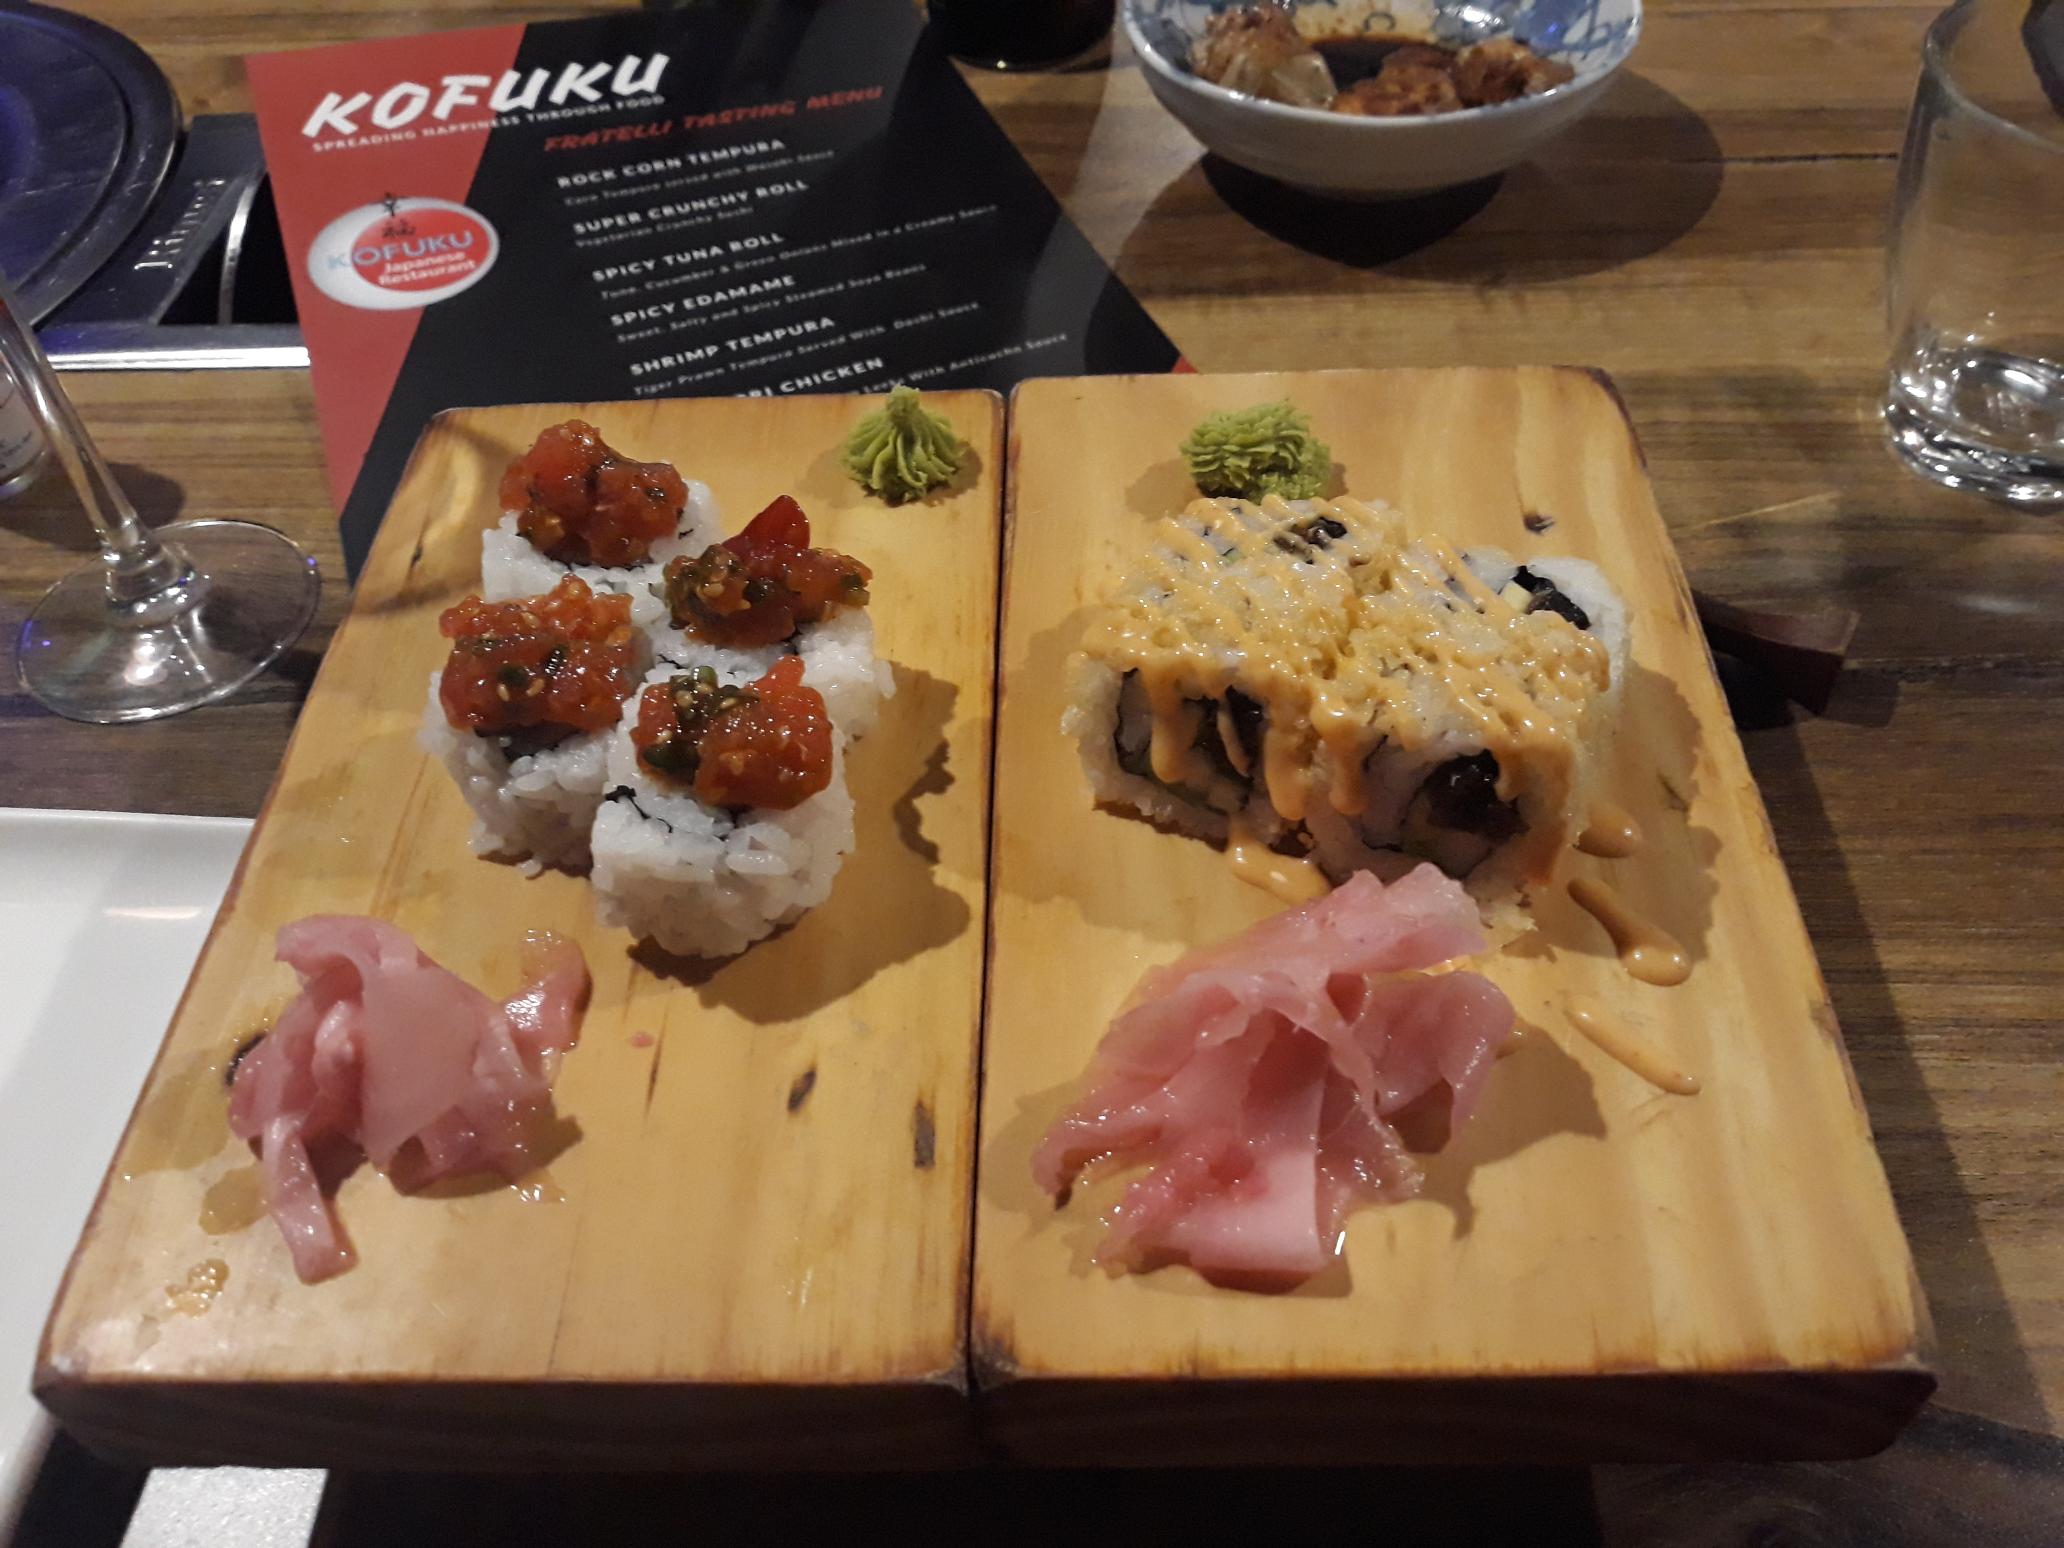 theimperfectblend-Kofuku- Japanese Restaurent in Mumbai